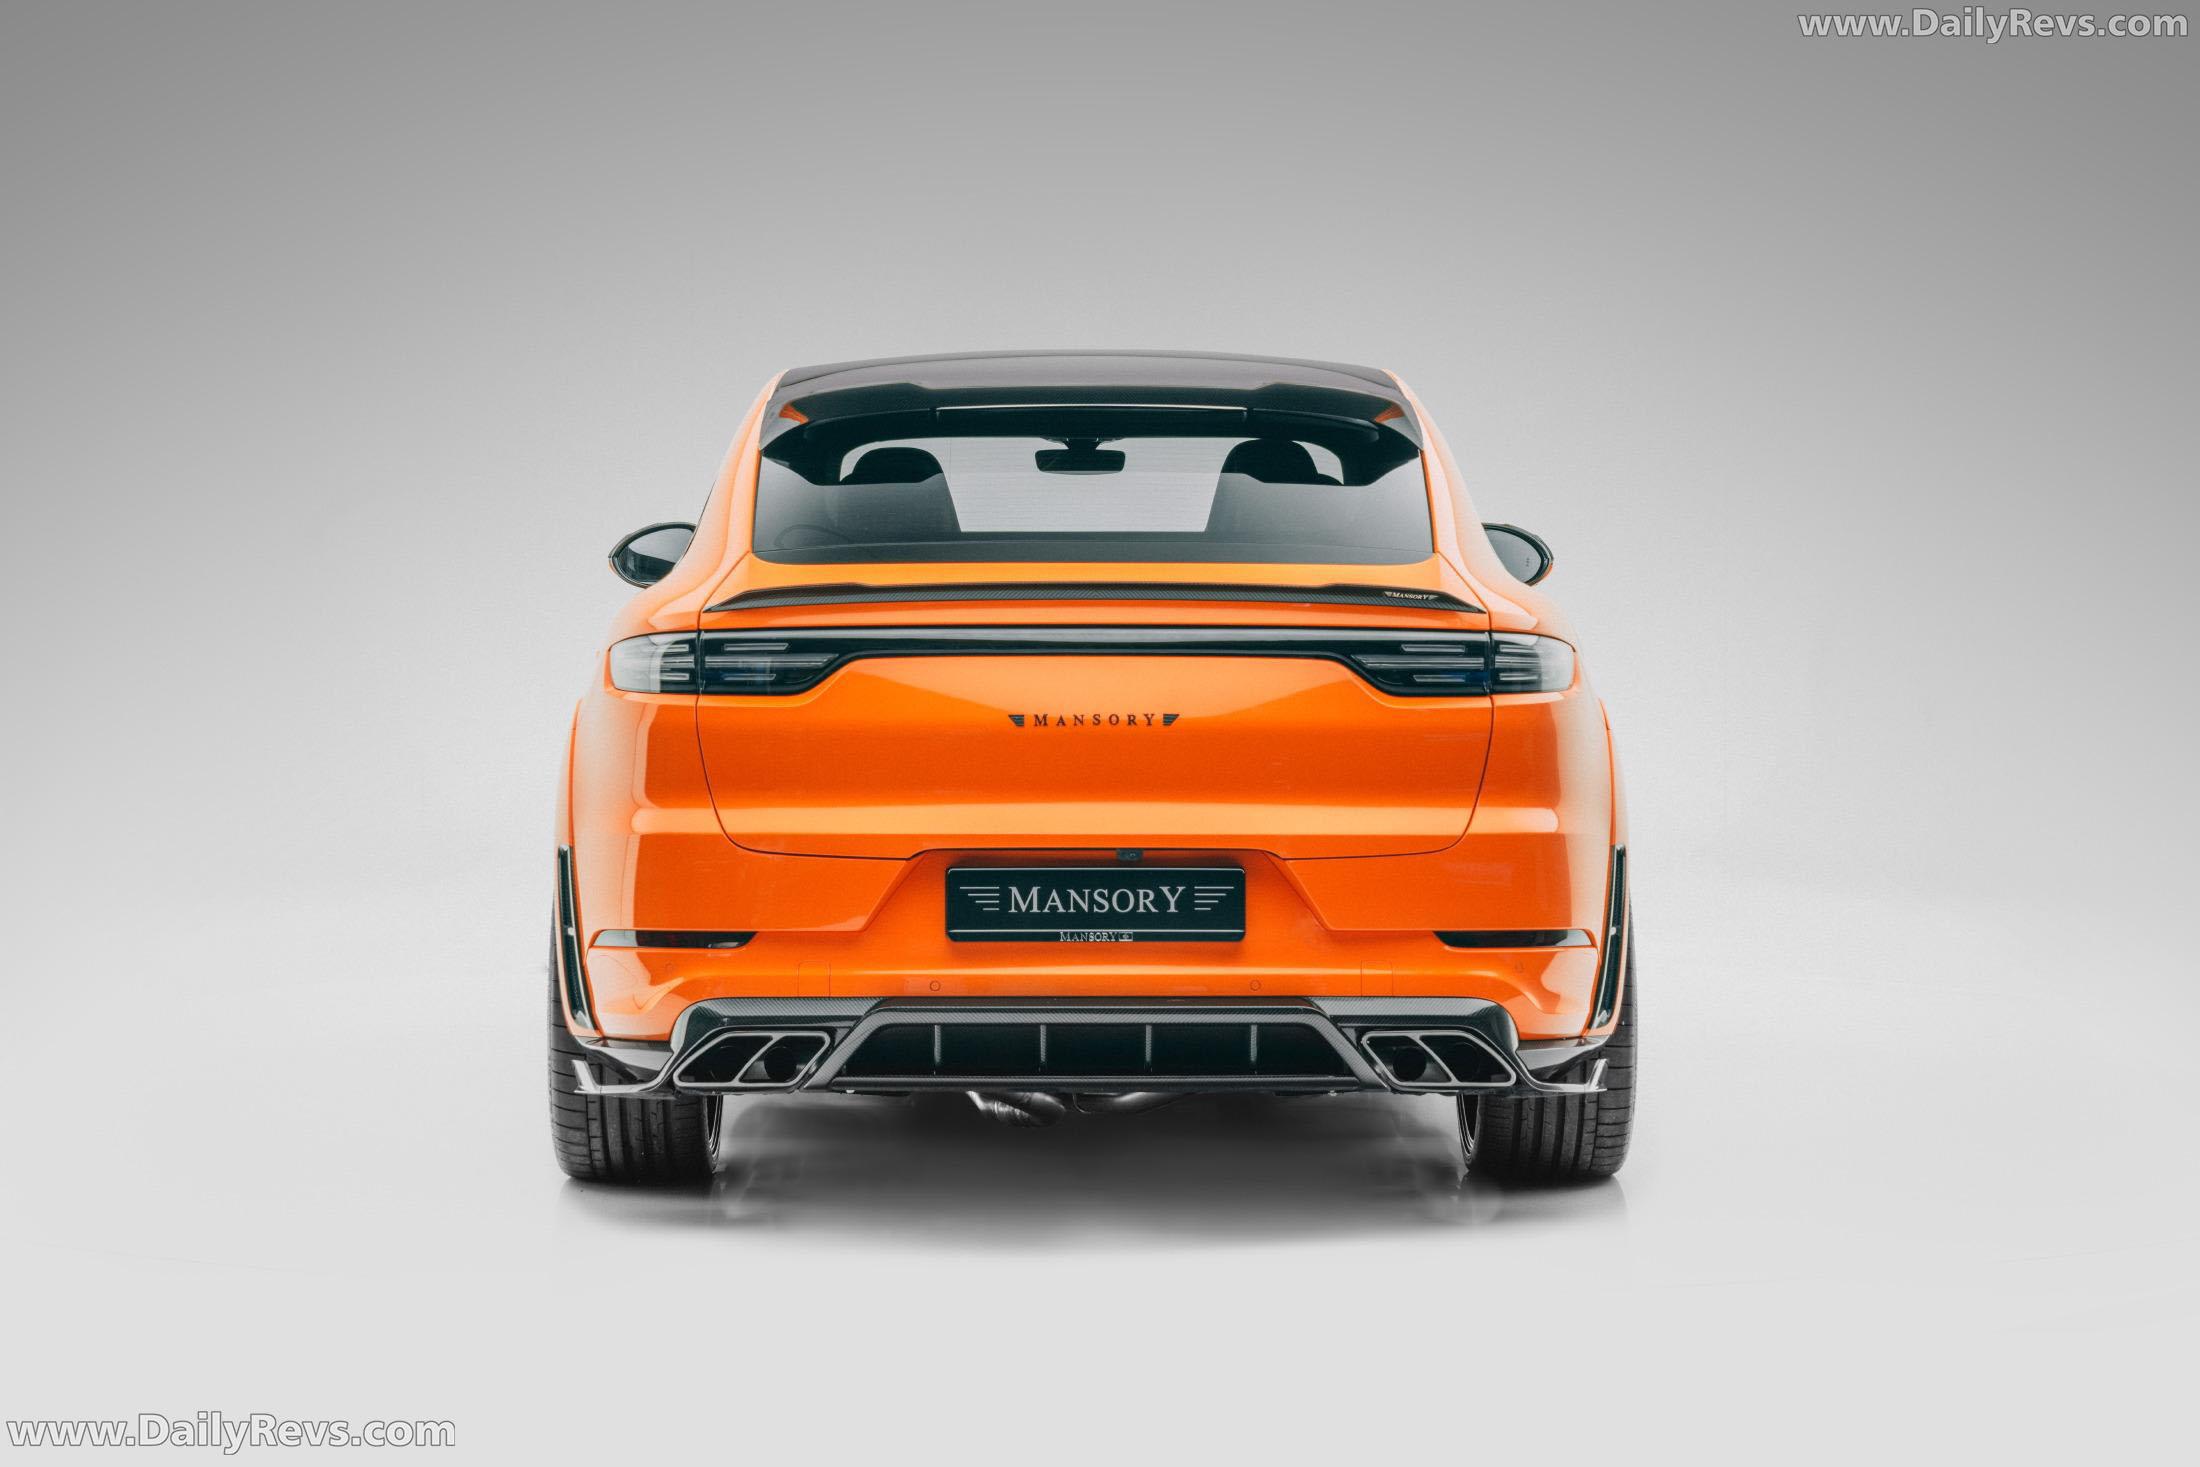 2020 Mansory Porsche Cayenne Turbo Coupe full